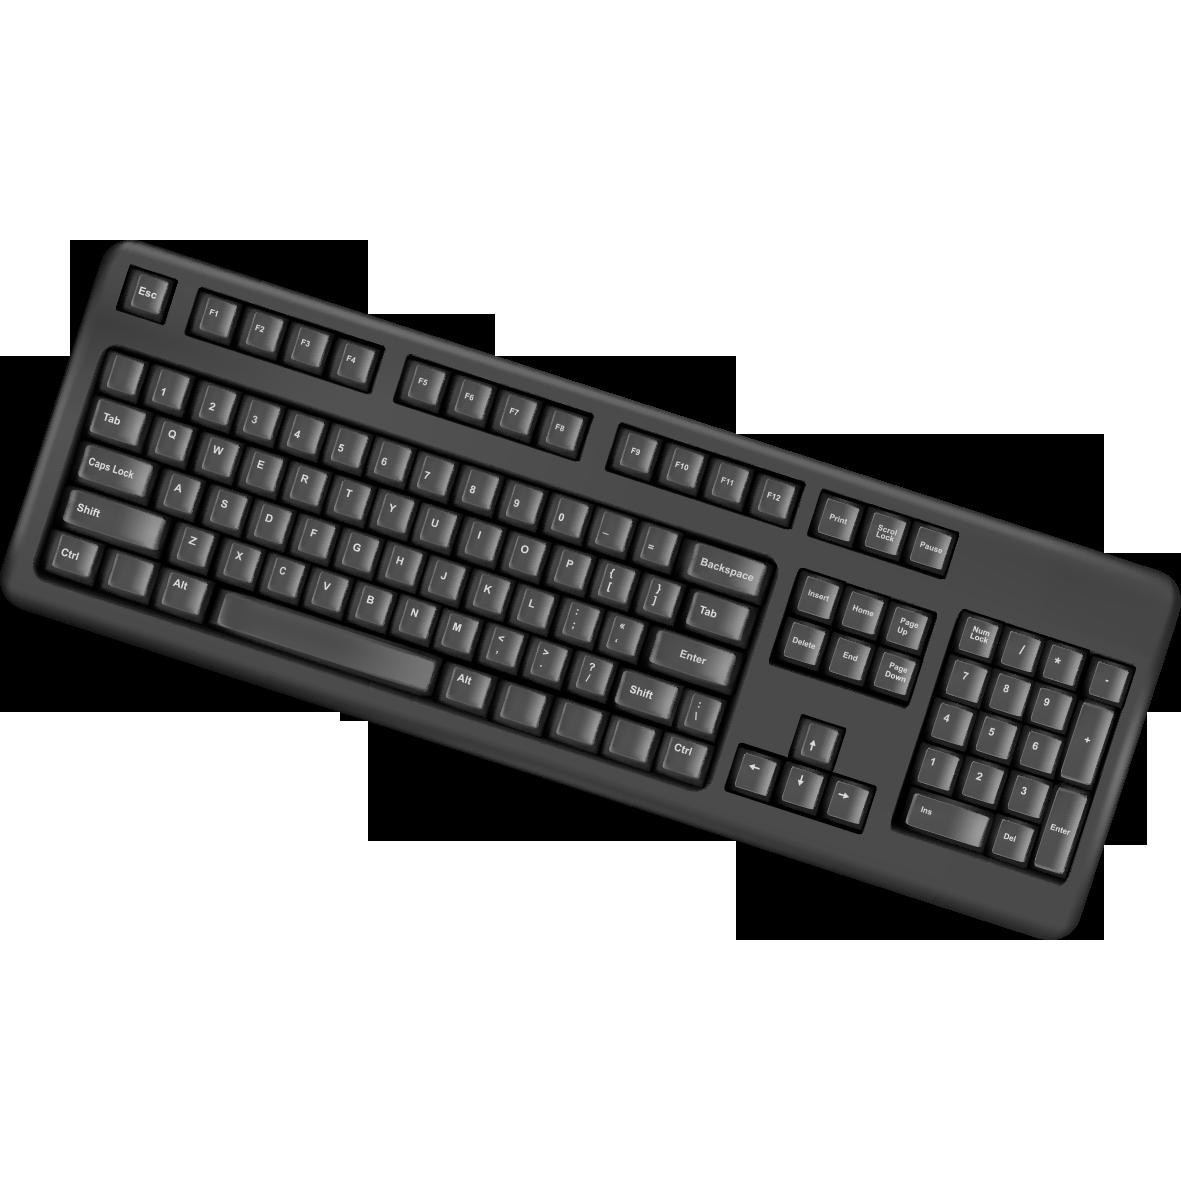 Computer keyboard clipart free image free download Computer keyboard Laptop PS/2 port Clip art - Creative black ... image free download